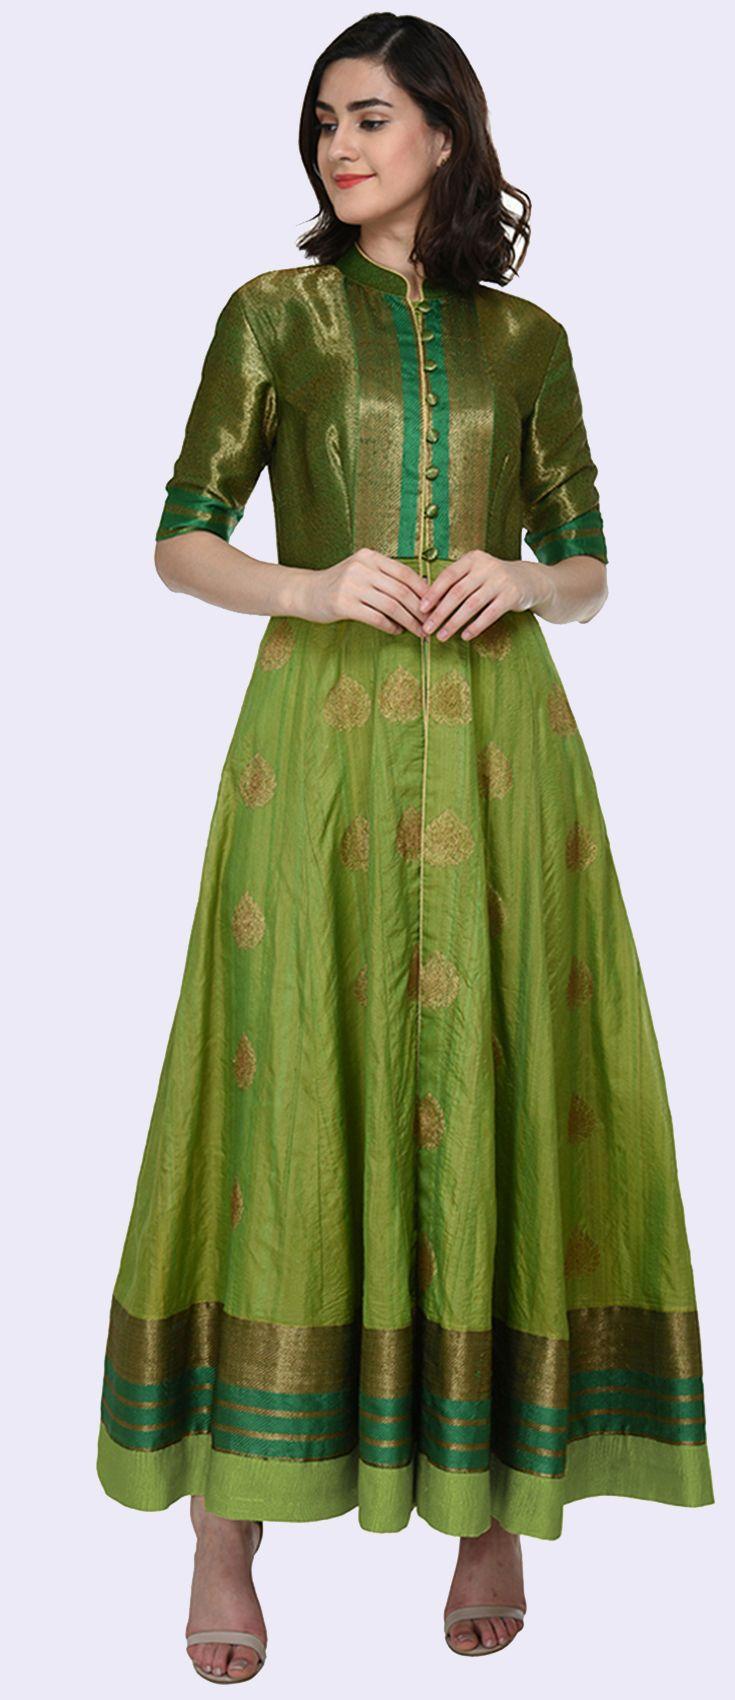 fdbb9e3f18b7b5 Green Resham   Zari Handwoven Pure Tussar Silk Kalidaar Peshwaz Suit. Green  Resham   Zari Handwoven Pure Tussar Silk Kalidaar Peshwaz Suit Saree Gown